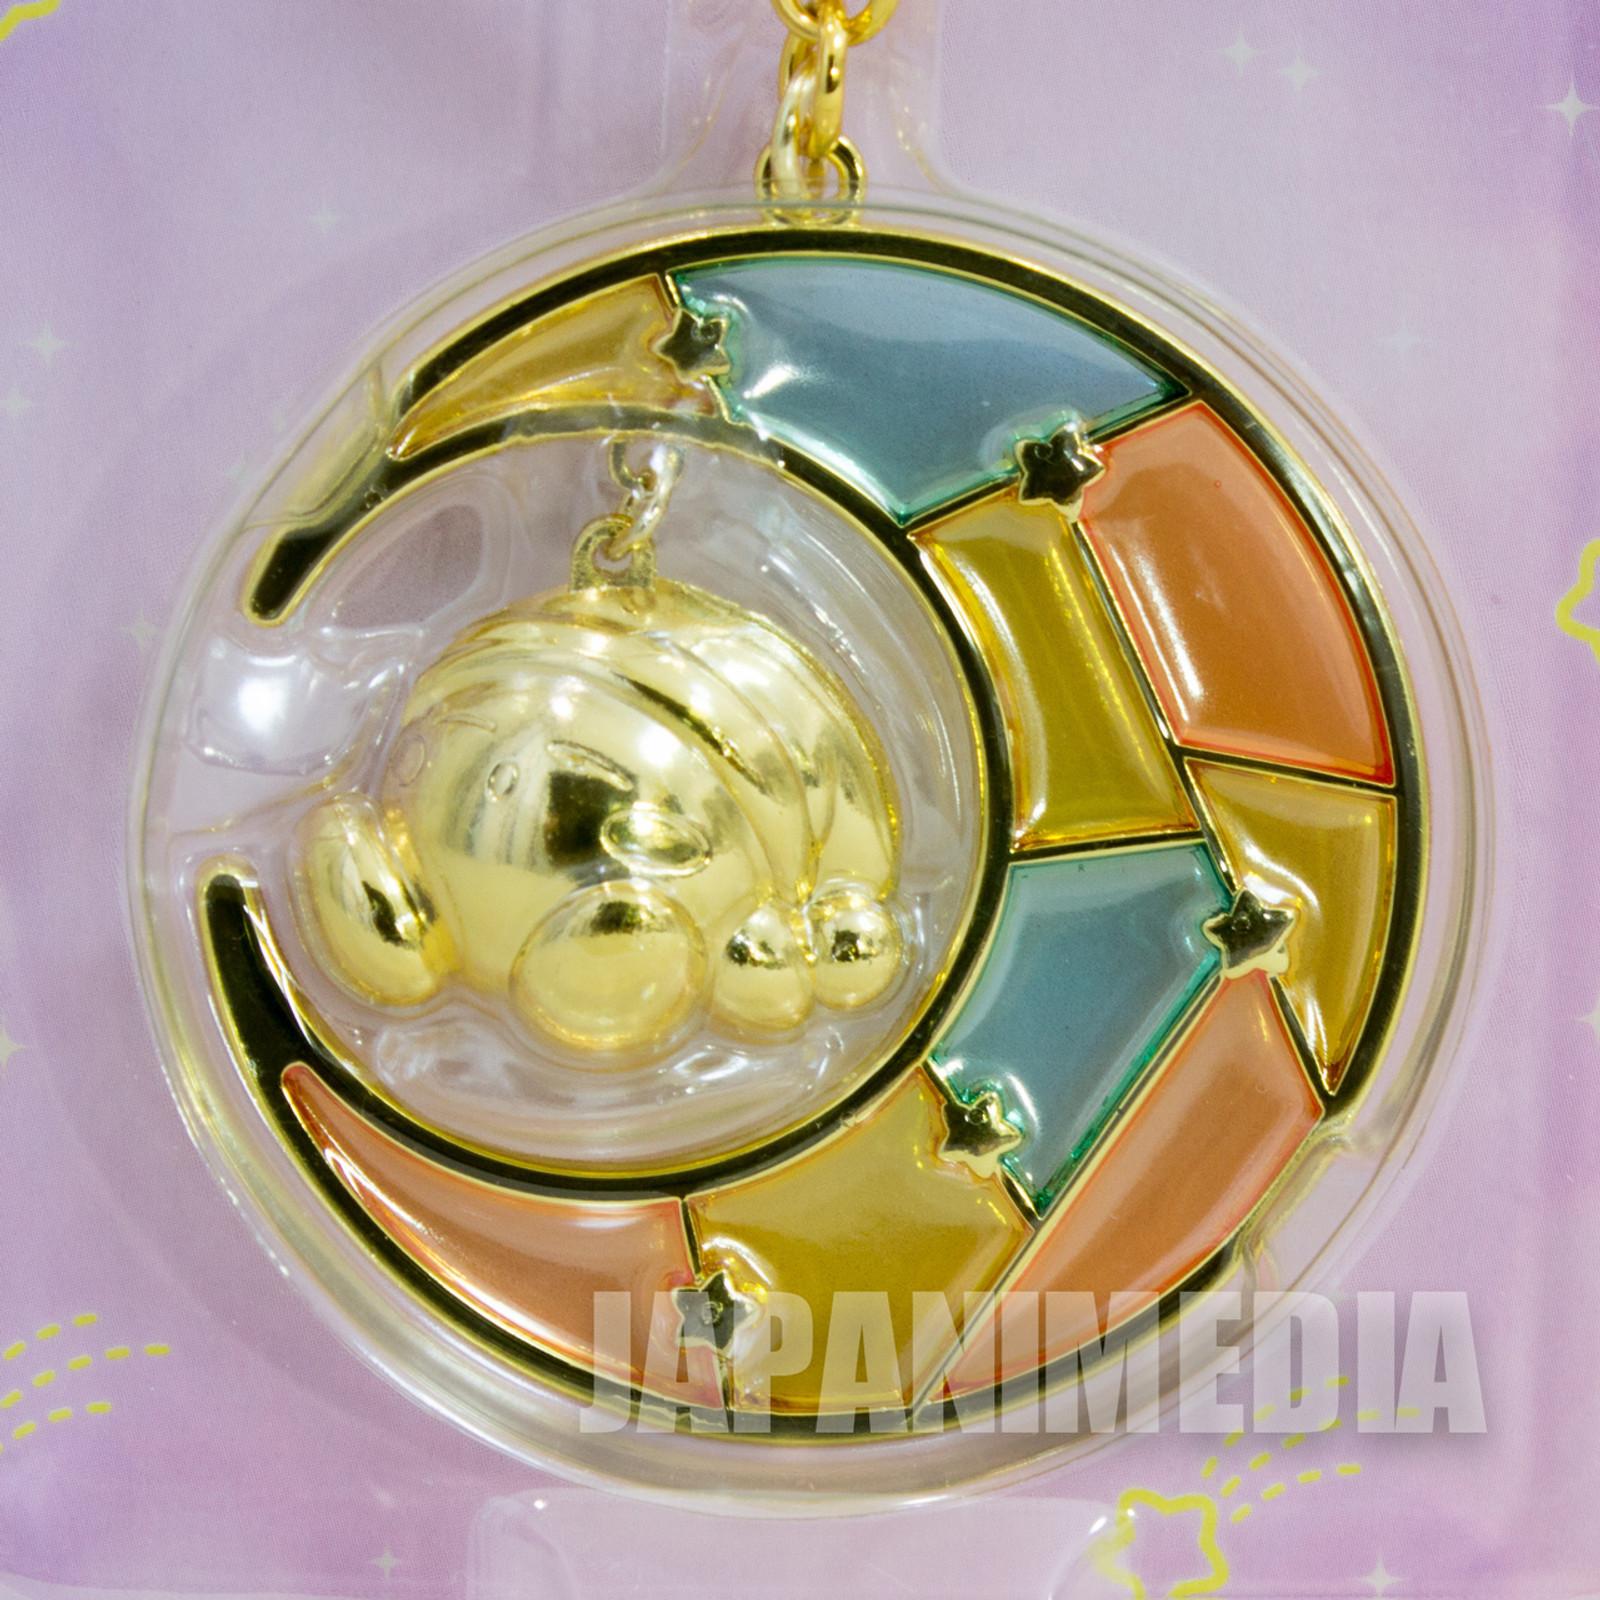 Kirby Super Star Twinkle Night Mascot Charm Keychain Banpresto JAPAN 3